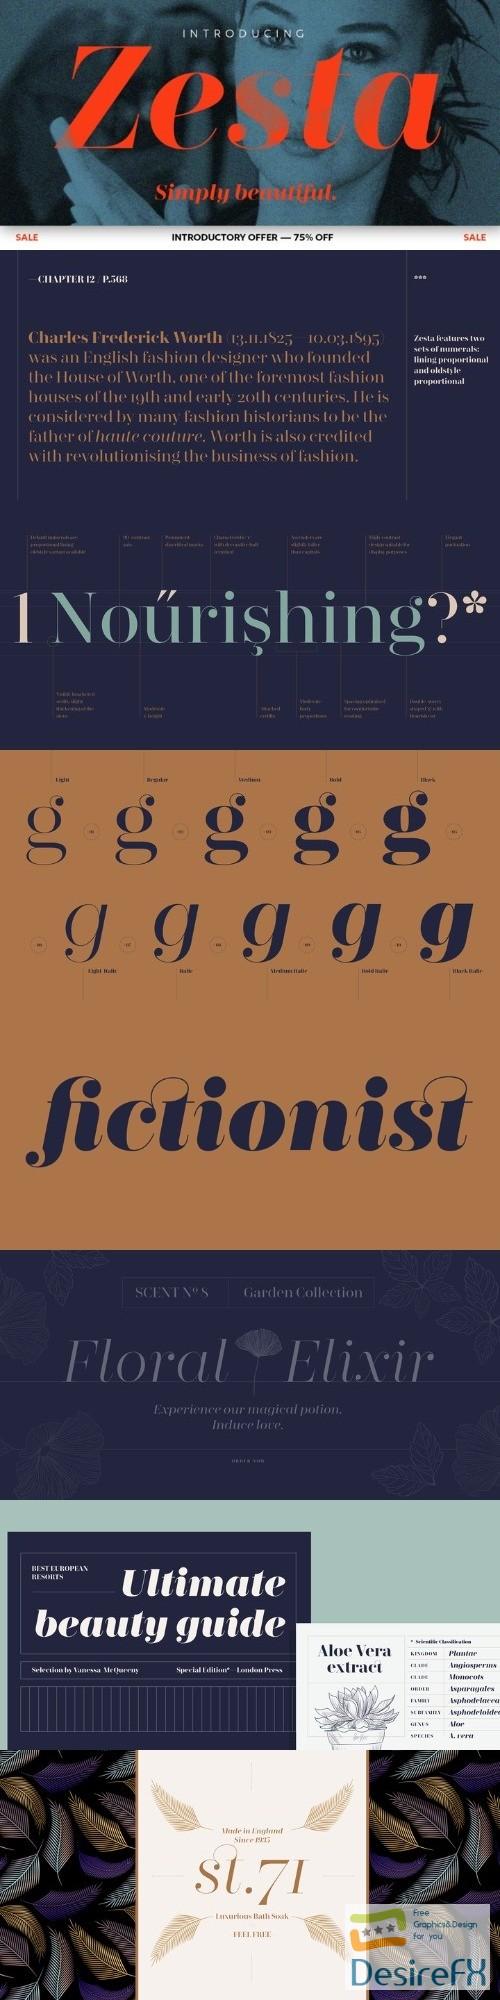 Desirefx com | Download Zesta font family